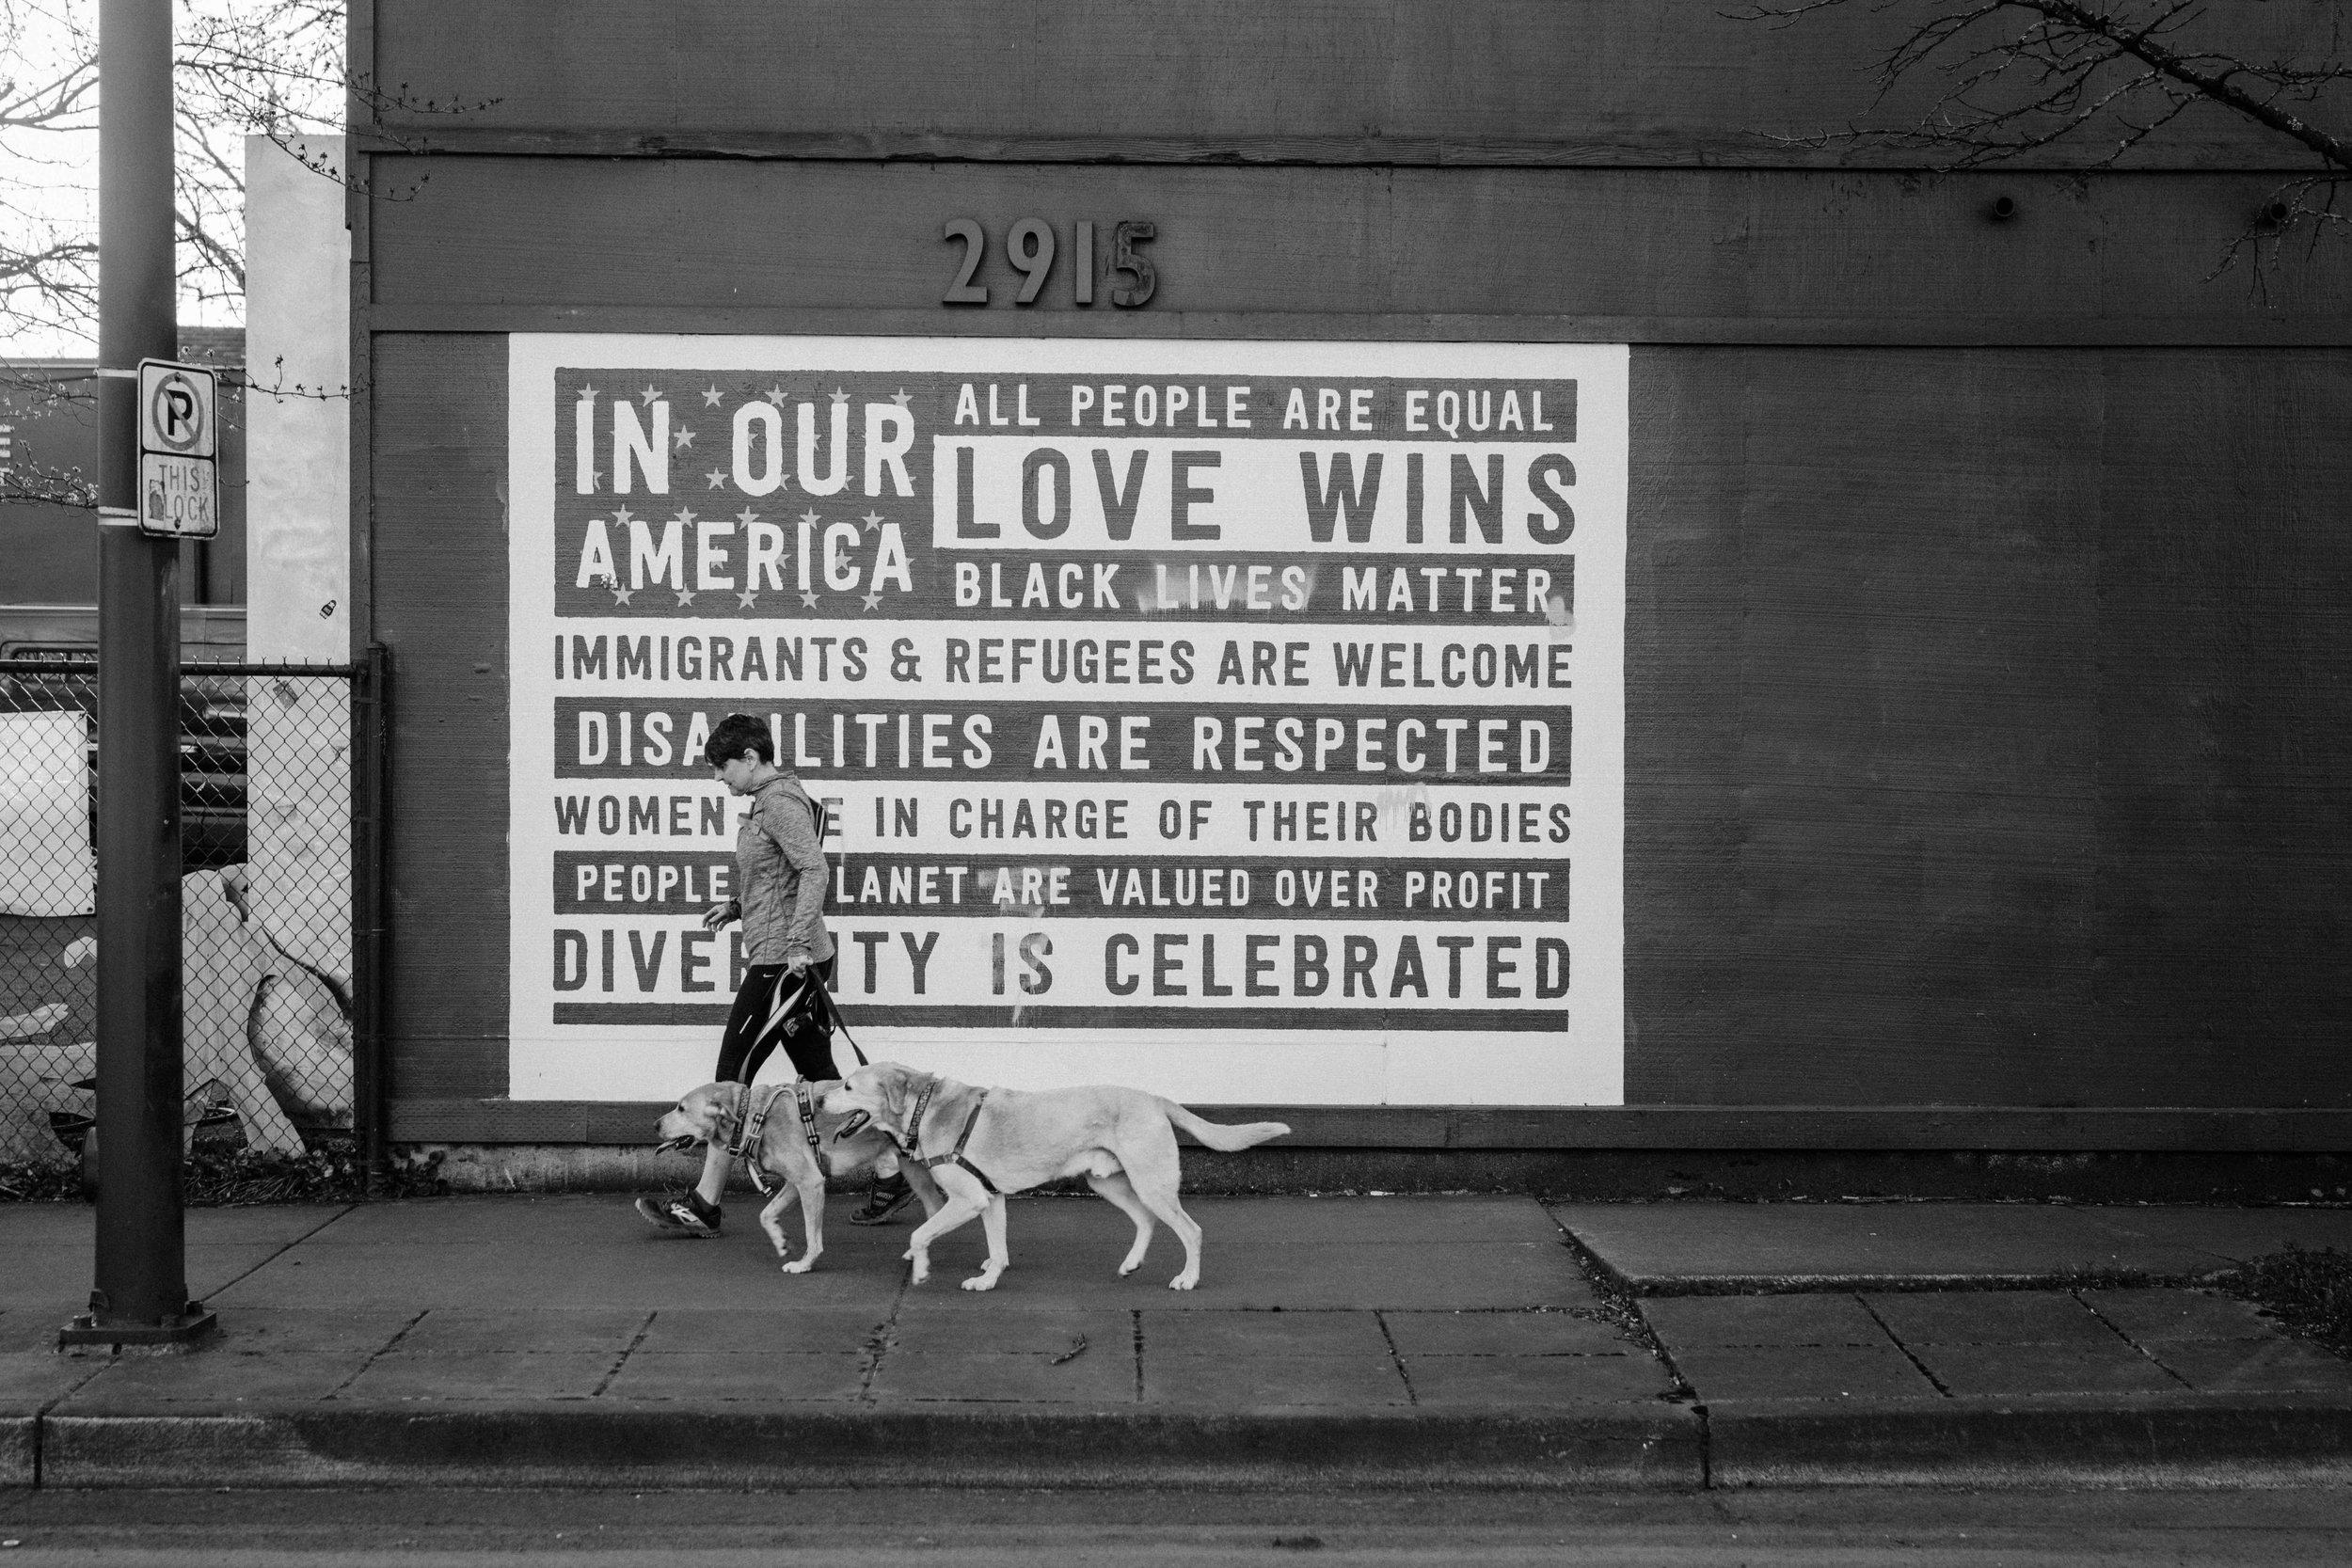 josue-rivas-america-sign.jpg